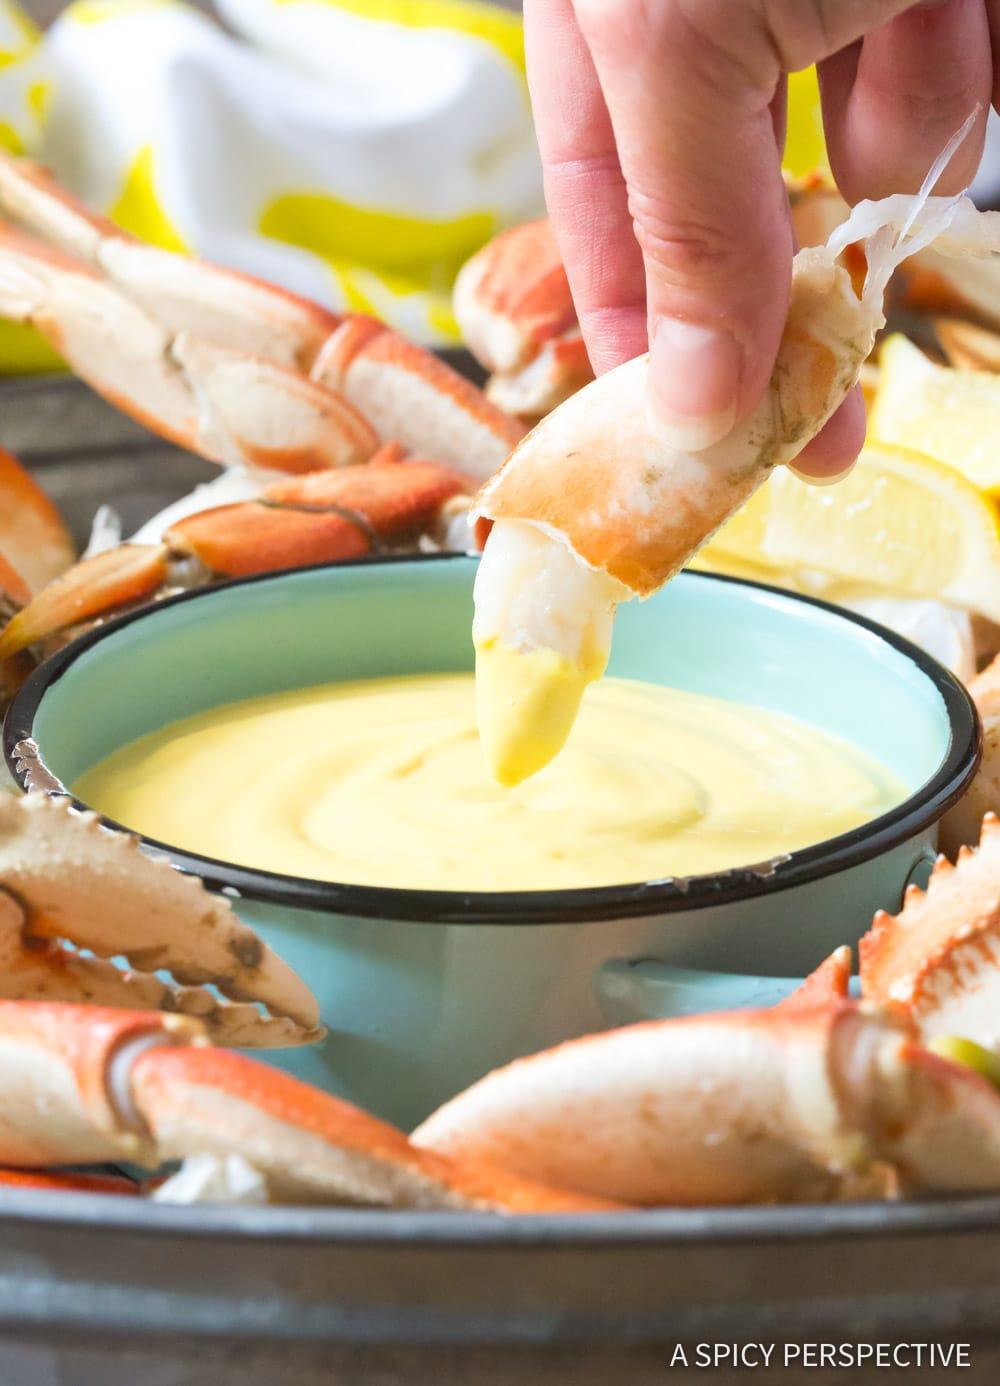 Easy Spicy Mustard Seafood Sauce #GlutenFree #DairyFree #Ketogenic